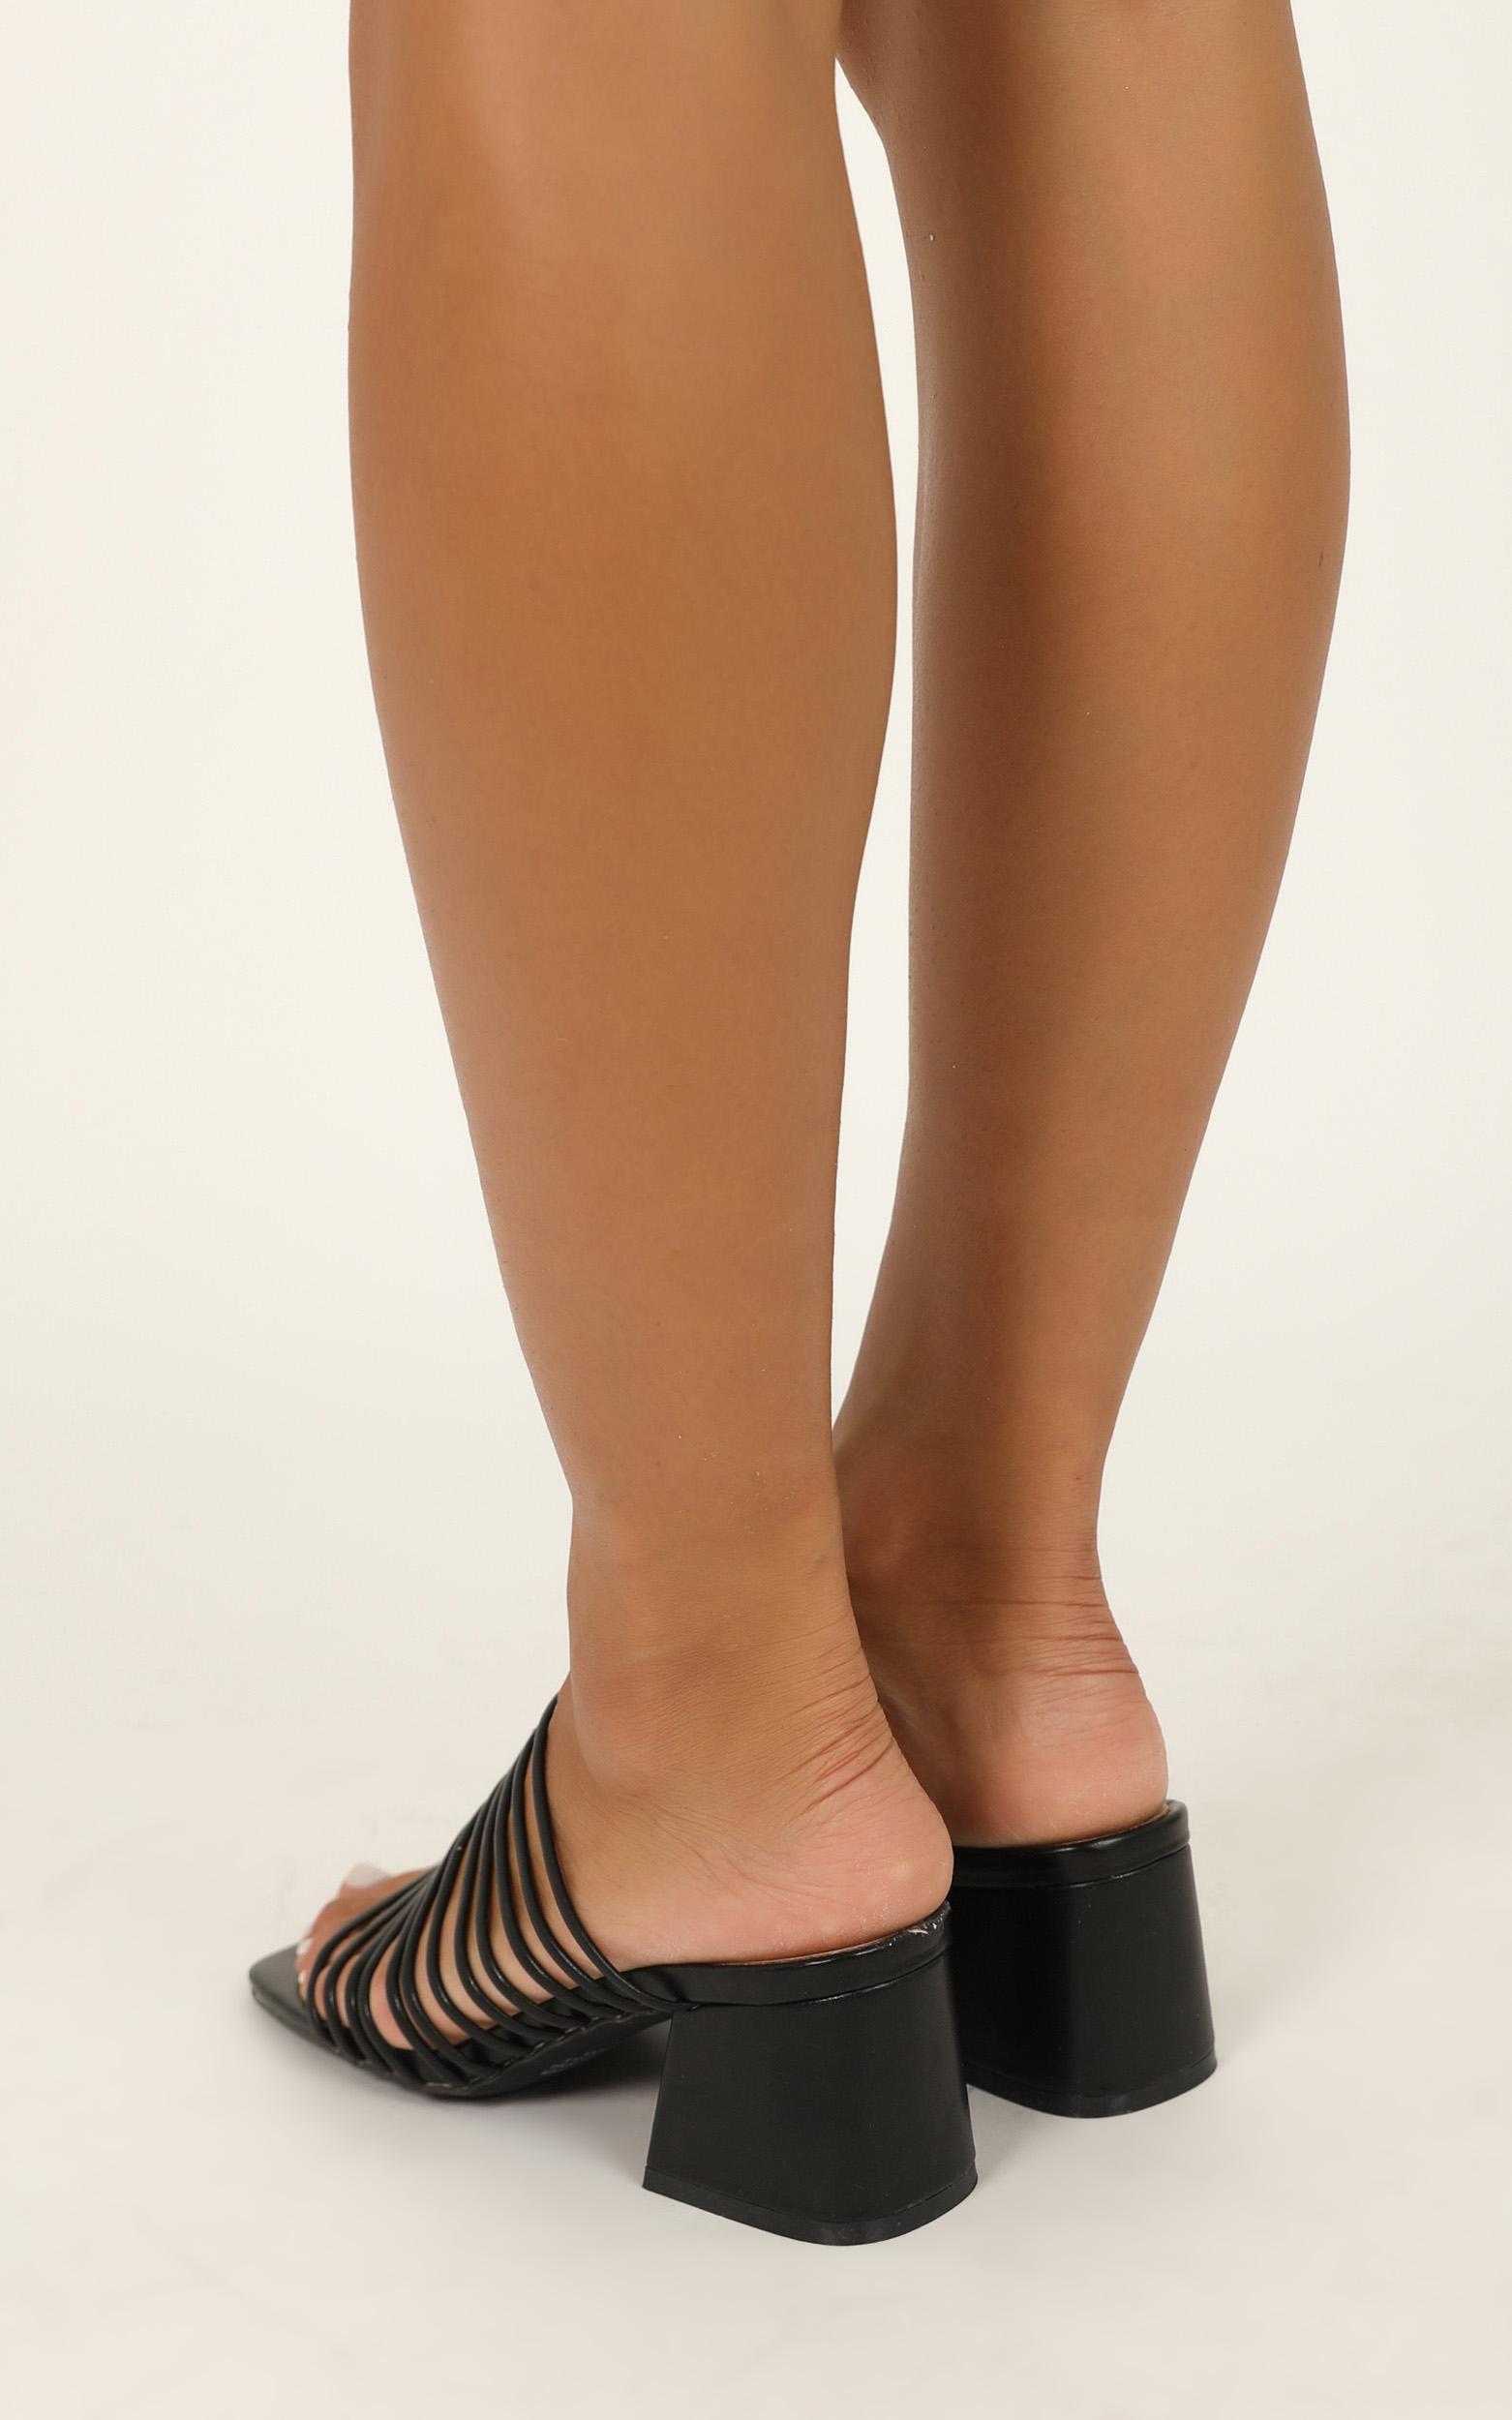 Therapy - Lola Heels in black - 10, Black, hi-res image number null